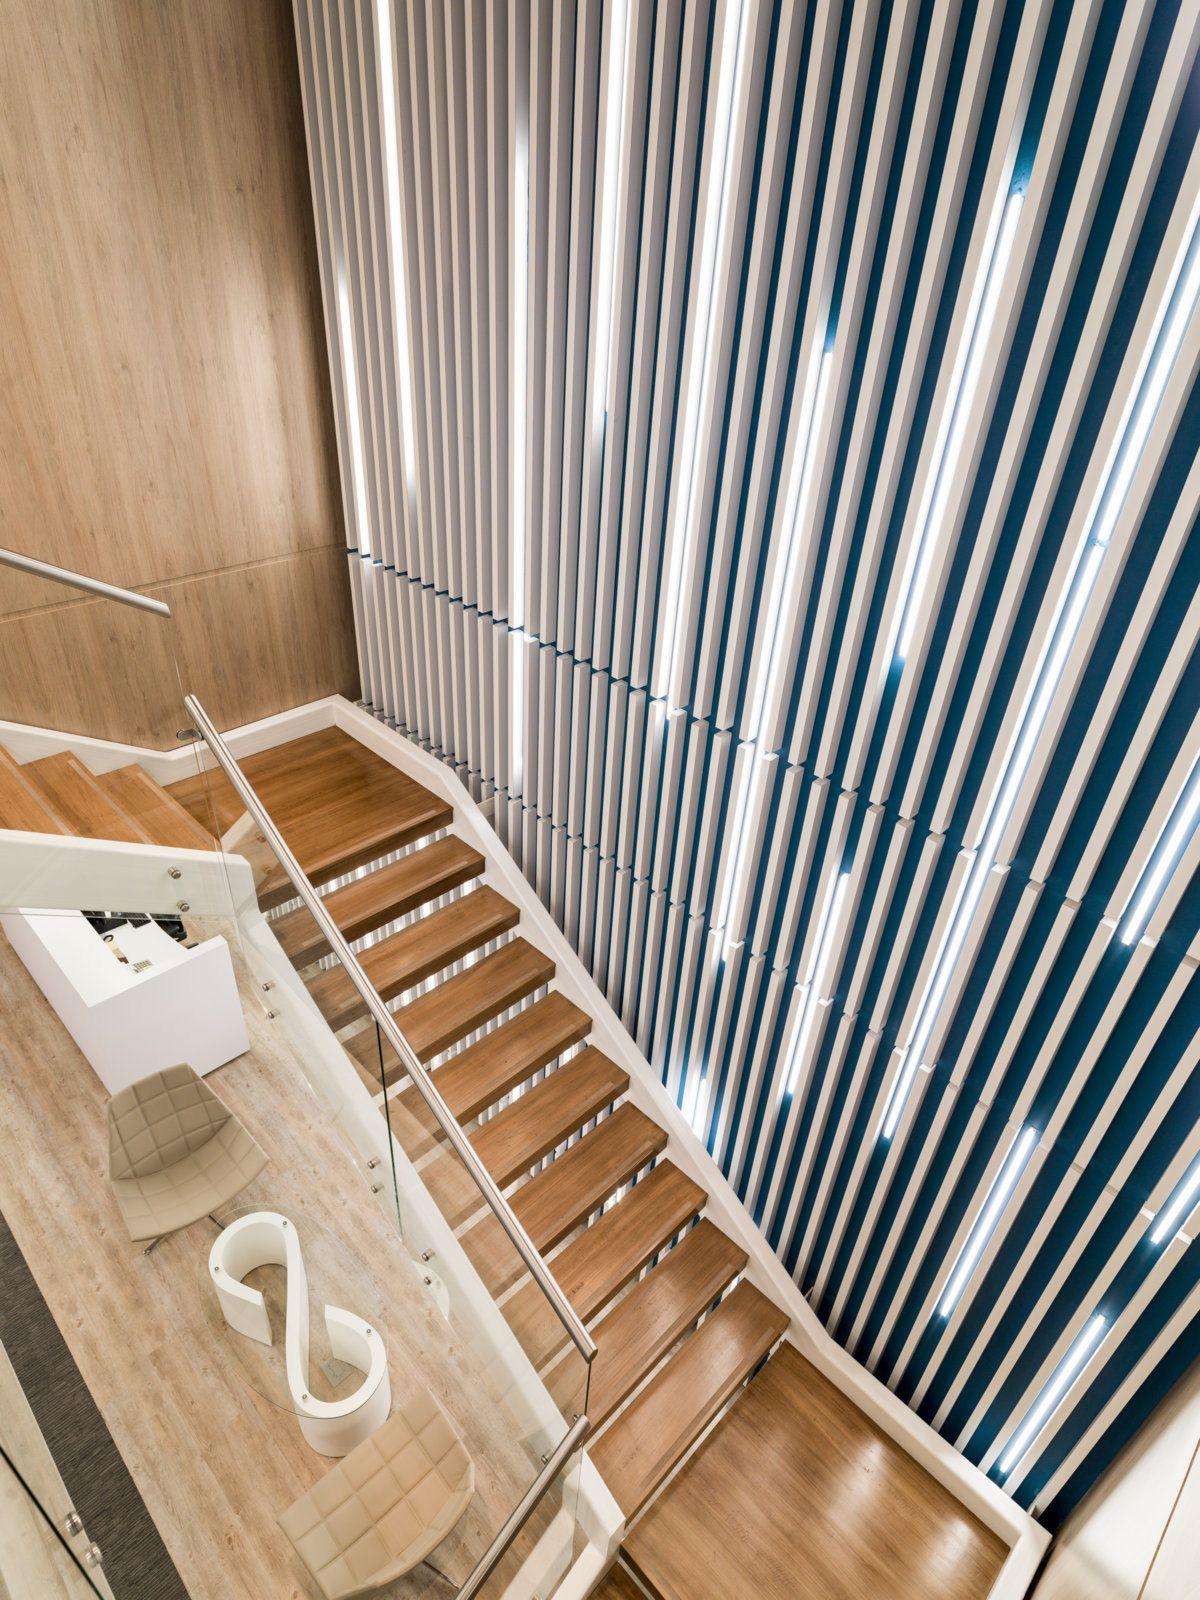 Best Office Tour Scor Offices – Bogotá Stair Railing Design 400 x 300